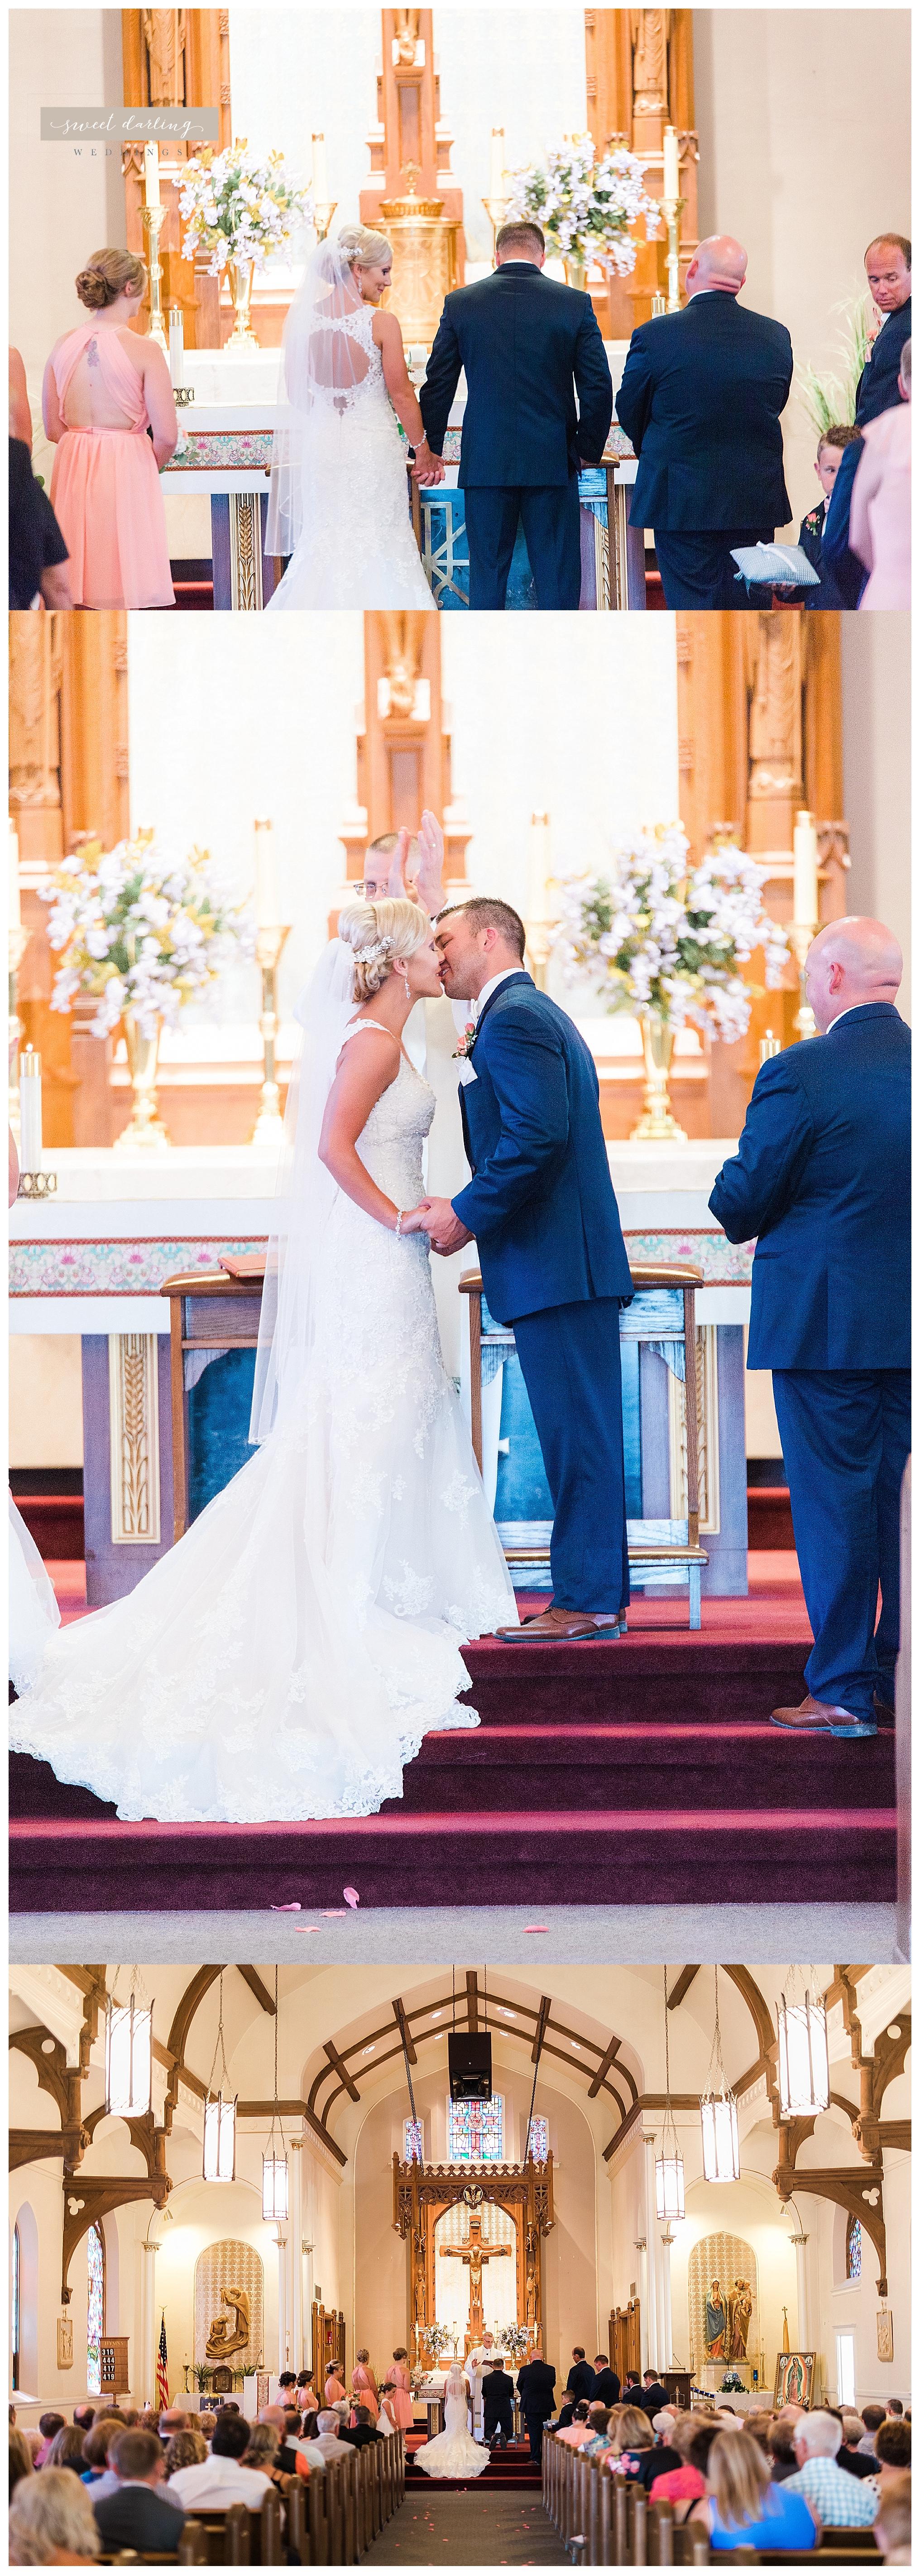 Paxton-illinois-engelbrecht-farmstead-romantic-wedding-photographer-sweet-darling-weddings_1222.jpg